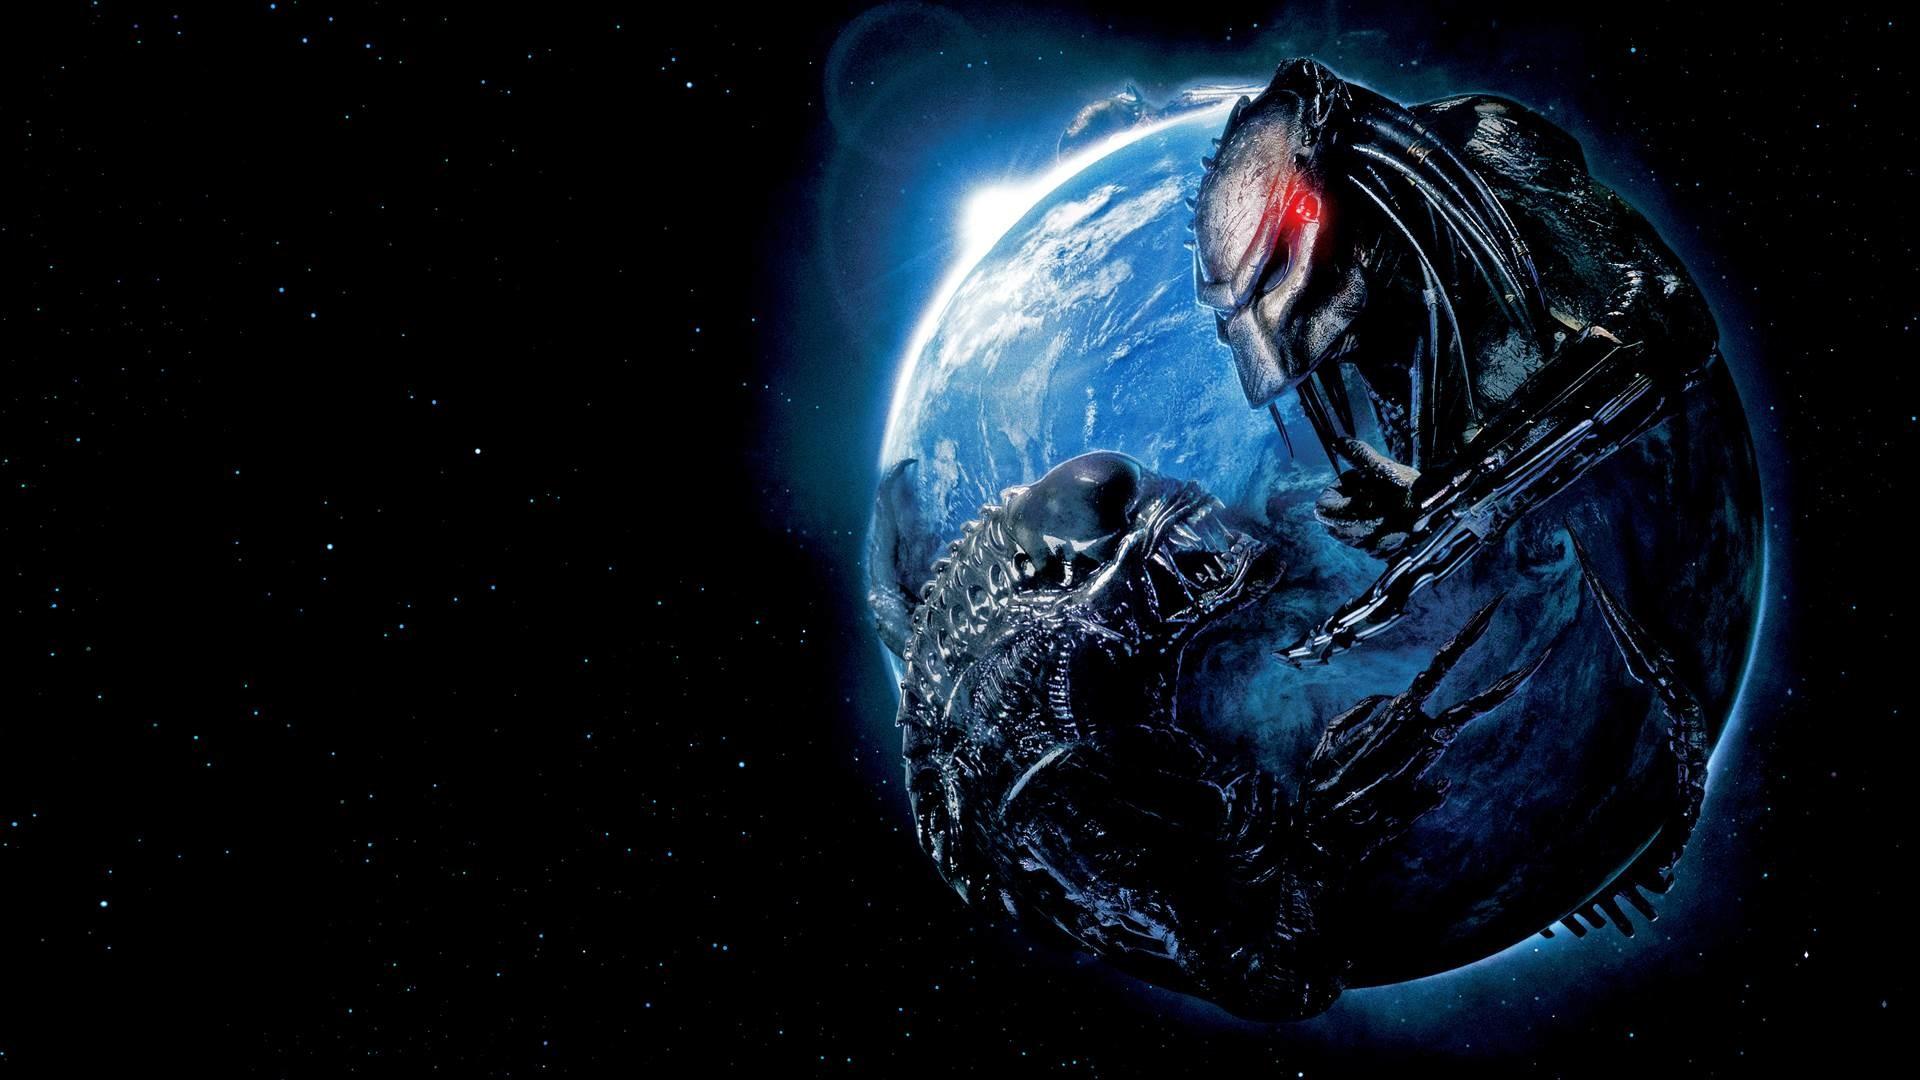 Alien Vs Predator Wallpaper 1